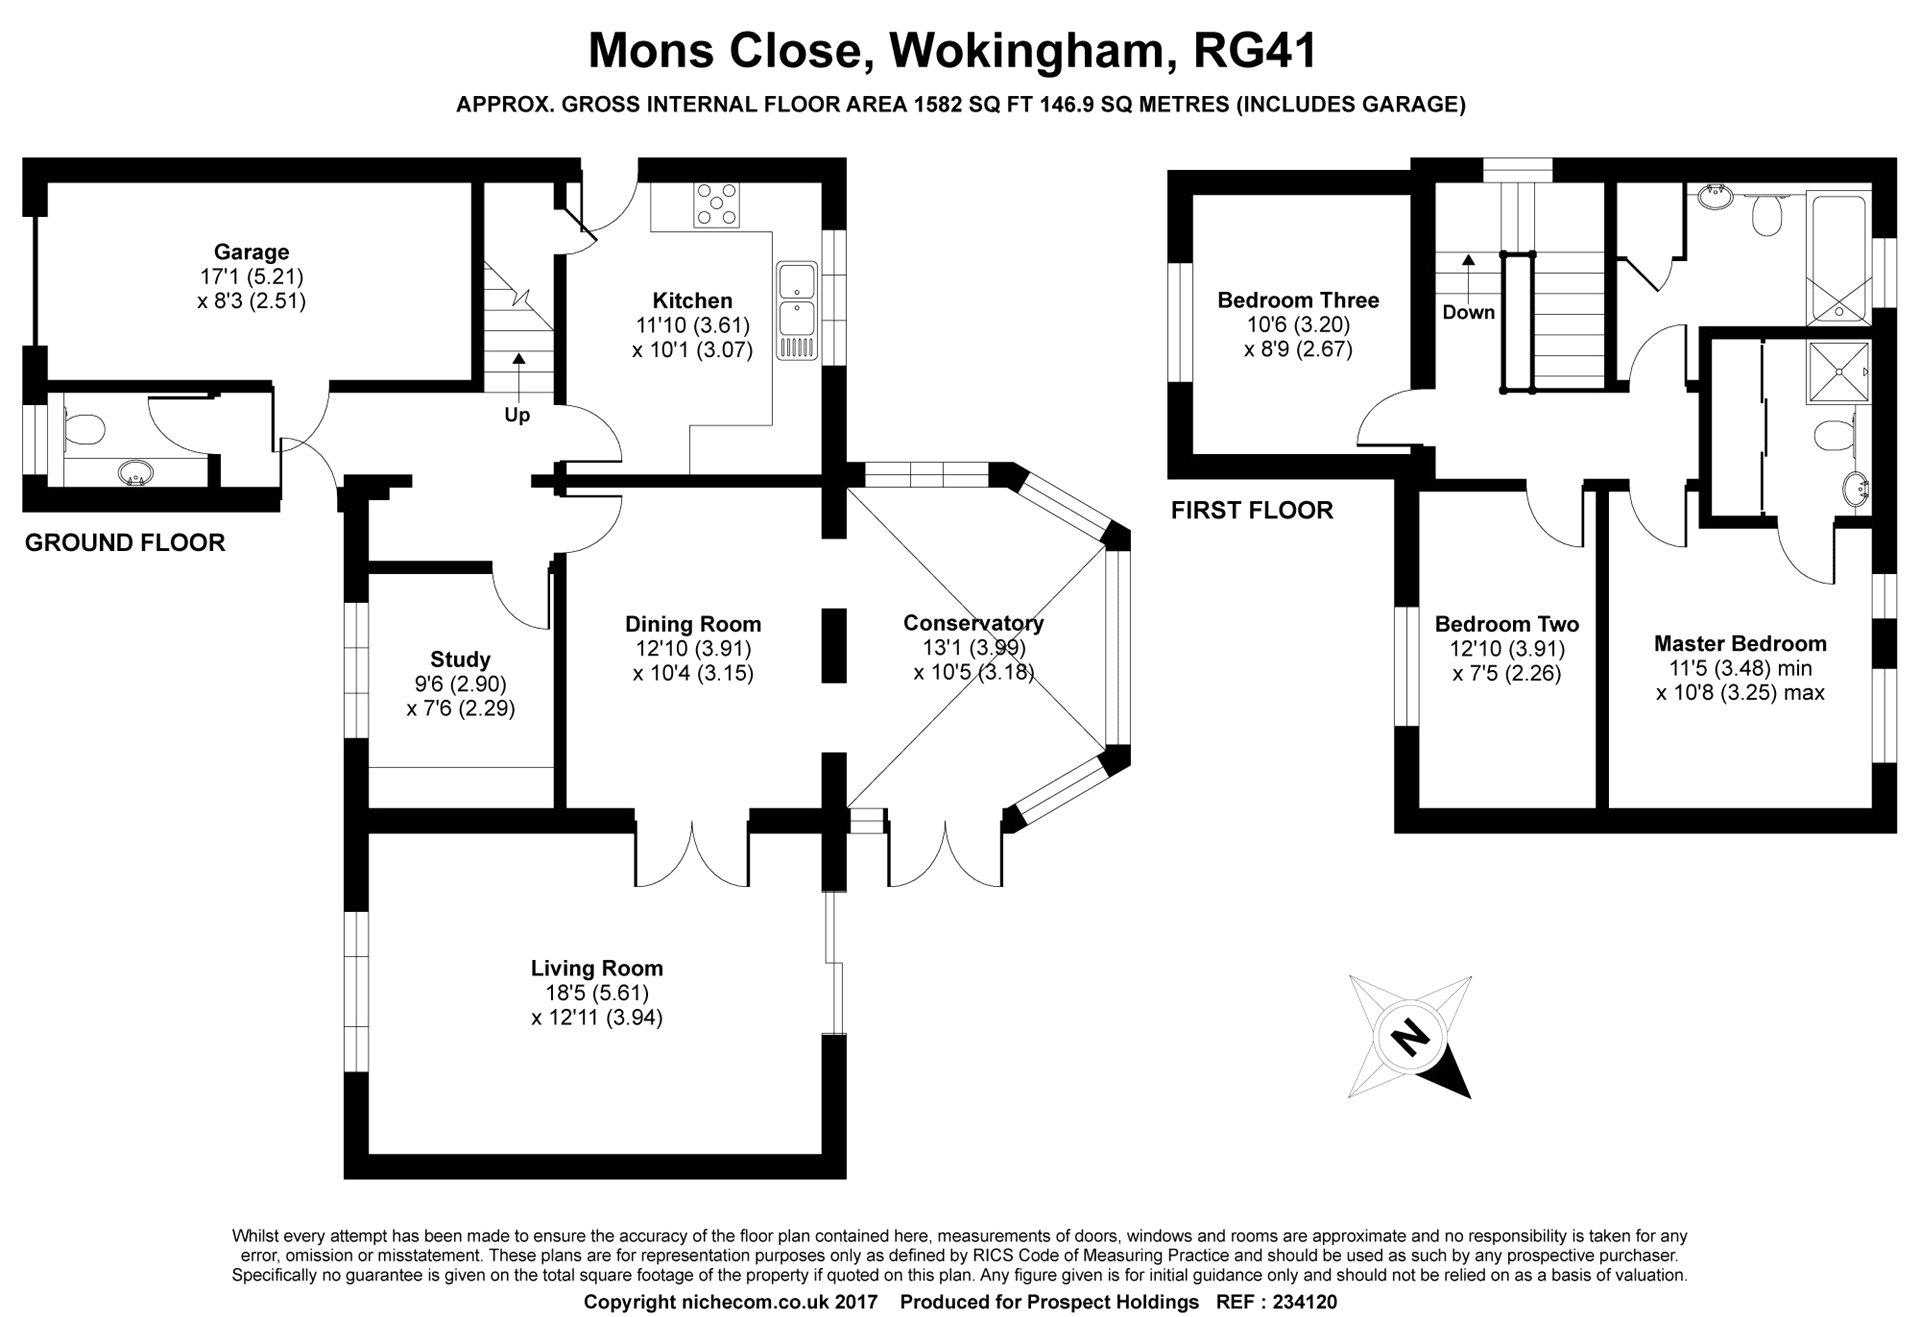 3 Bedrooms Detached house for sale in Mons Close, Wokingham, Berkshire RG41